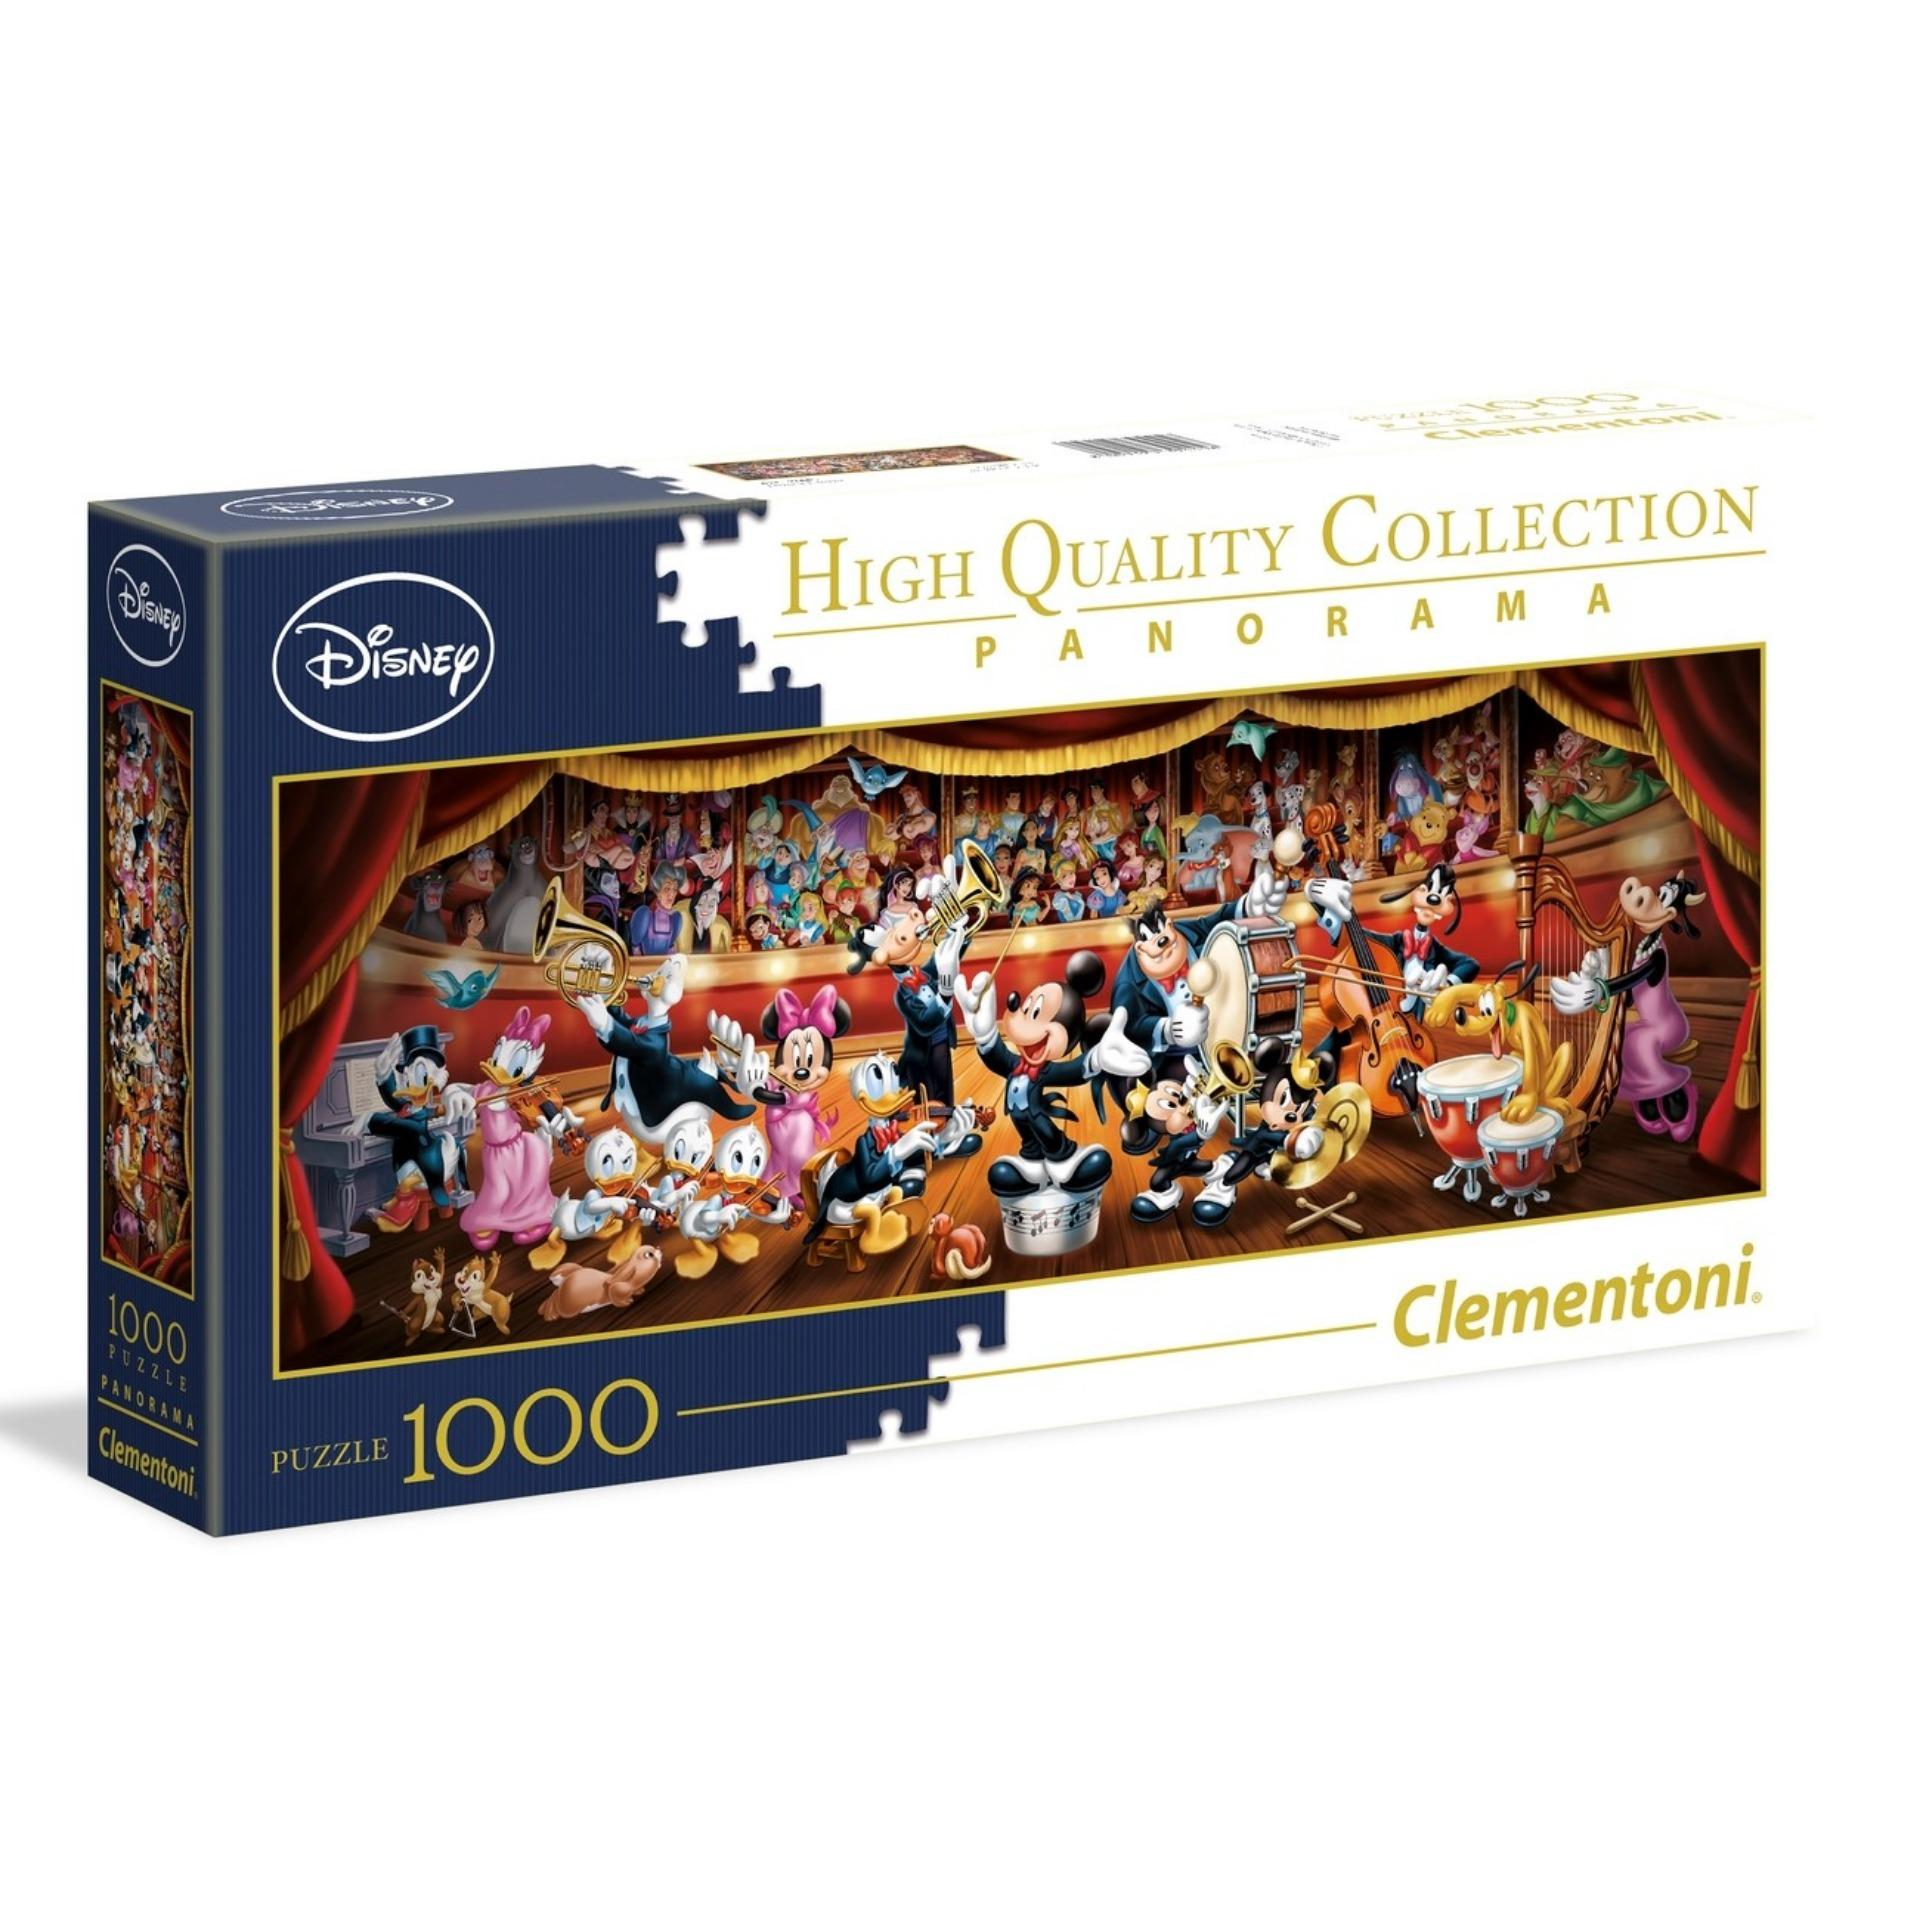 Clementoni 1000Pcs Panorama Jigsaw Puzzle Disney Orchestra